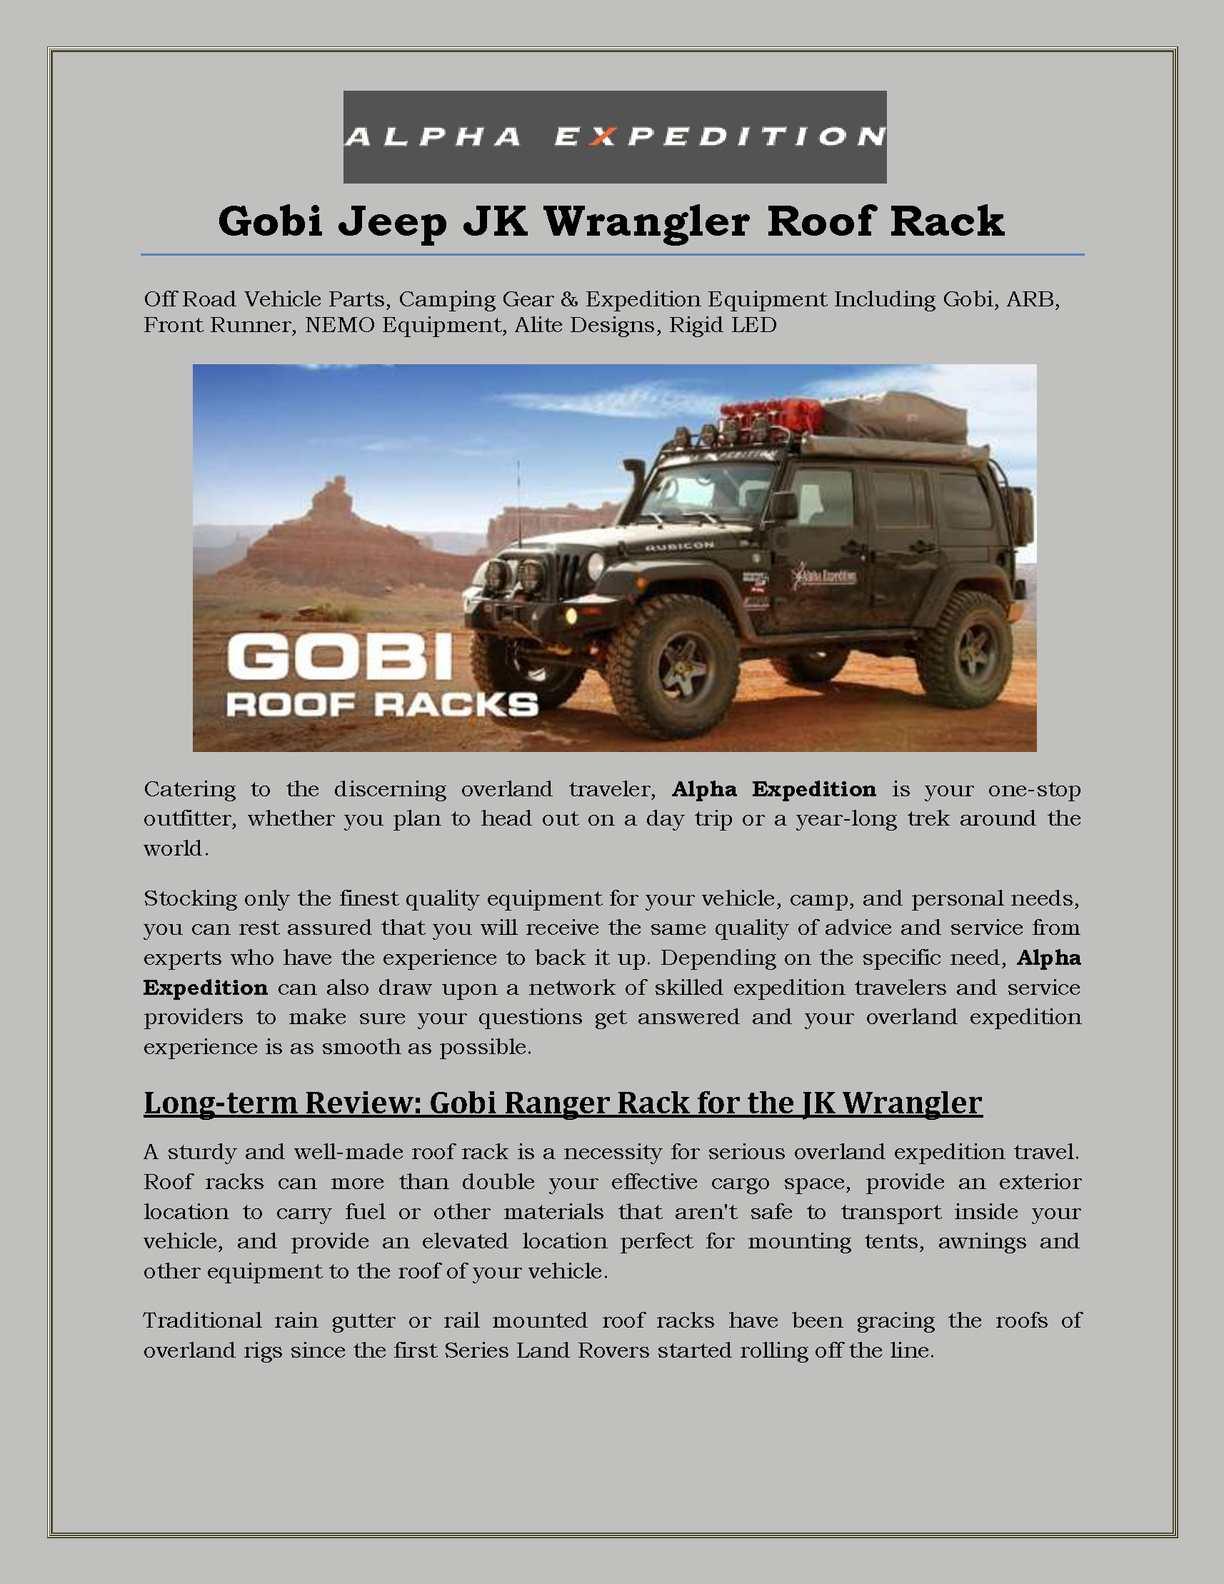 Calamo Gobi Jeep Jk Wrangler Roof Rack Expedition